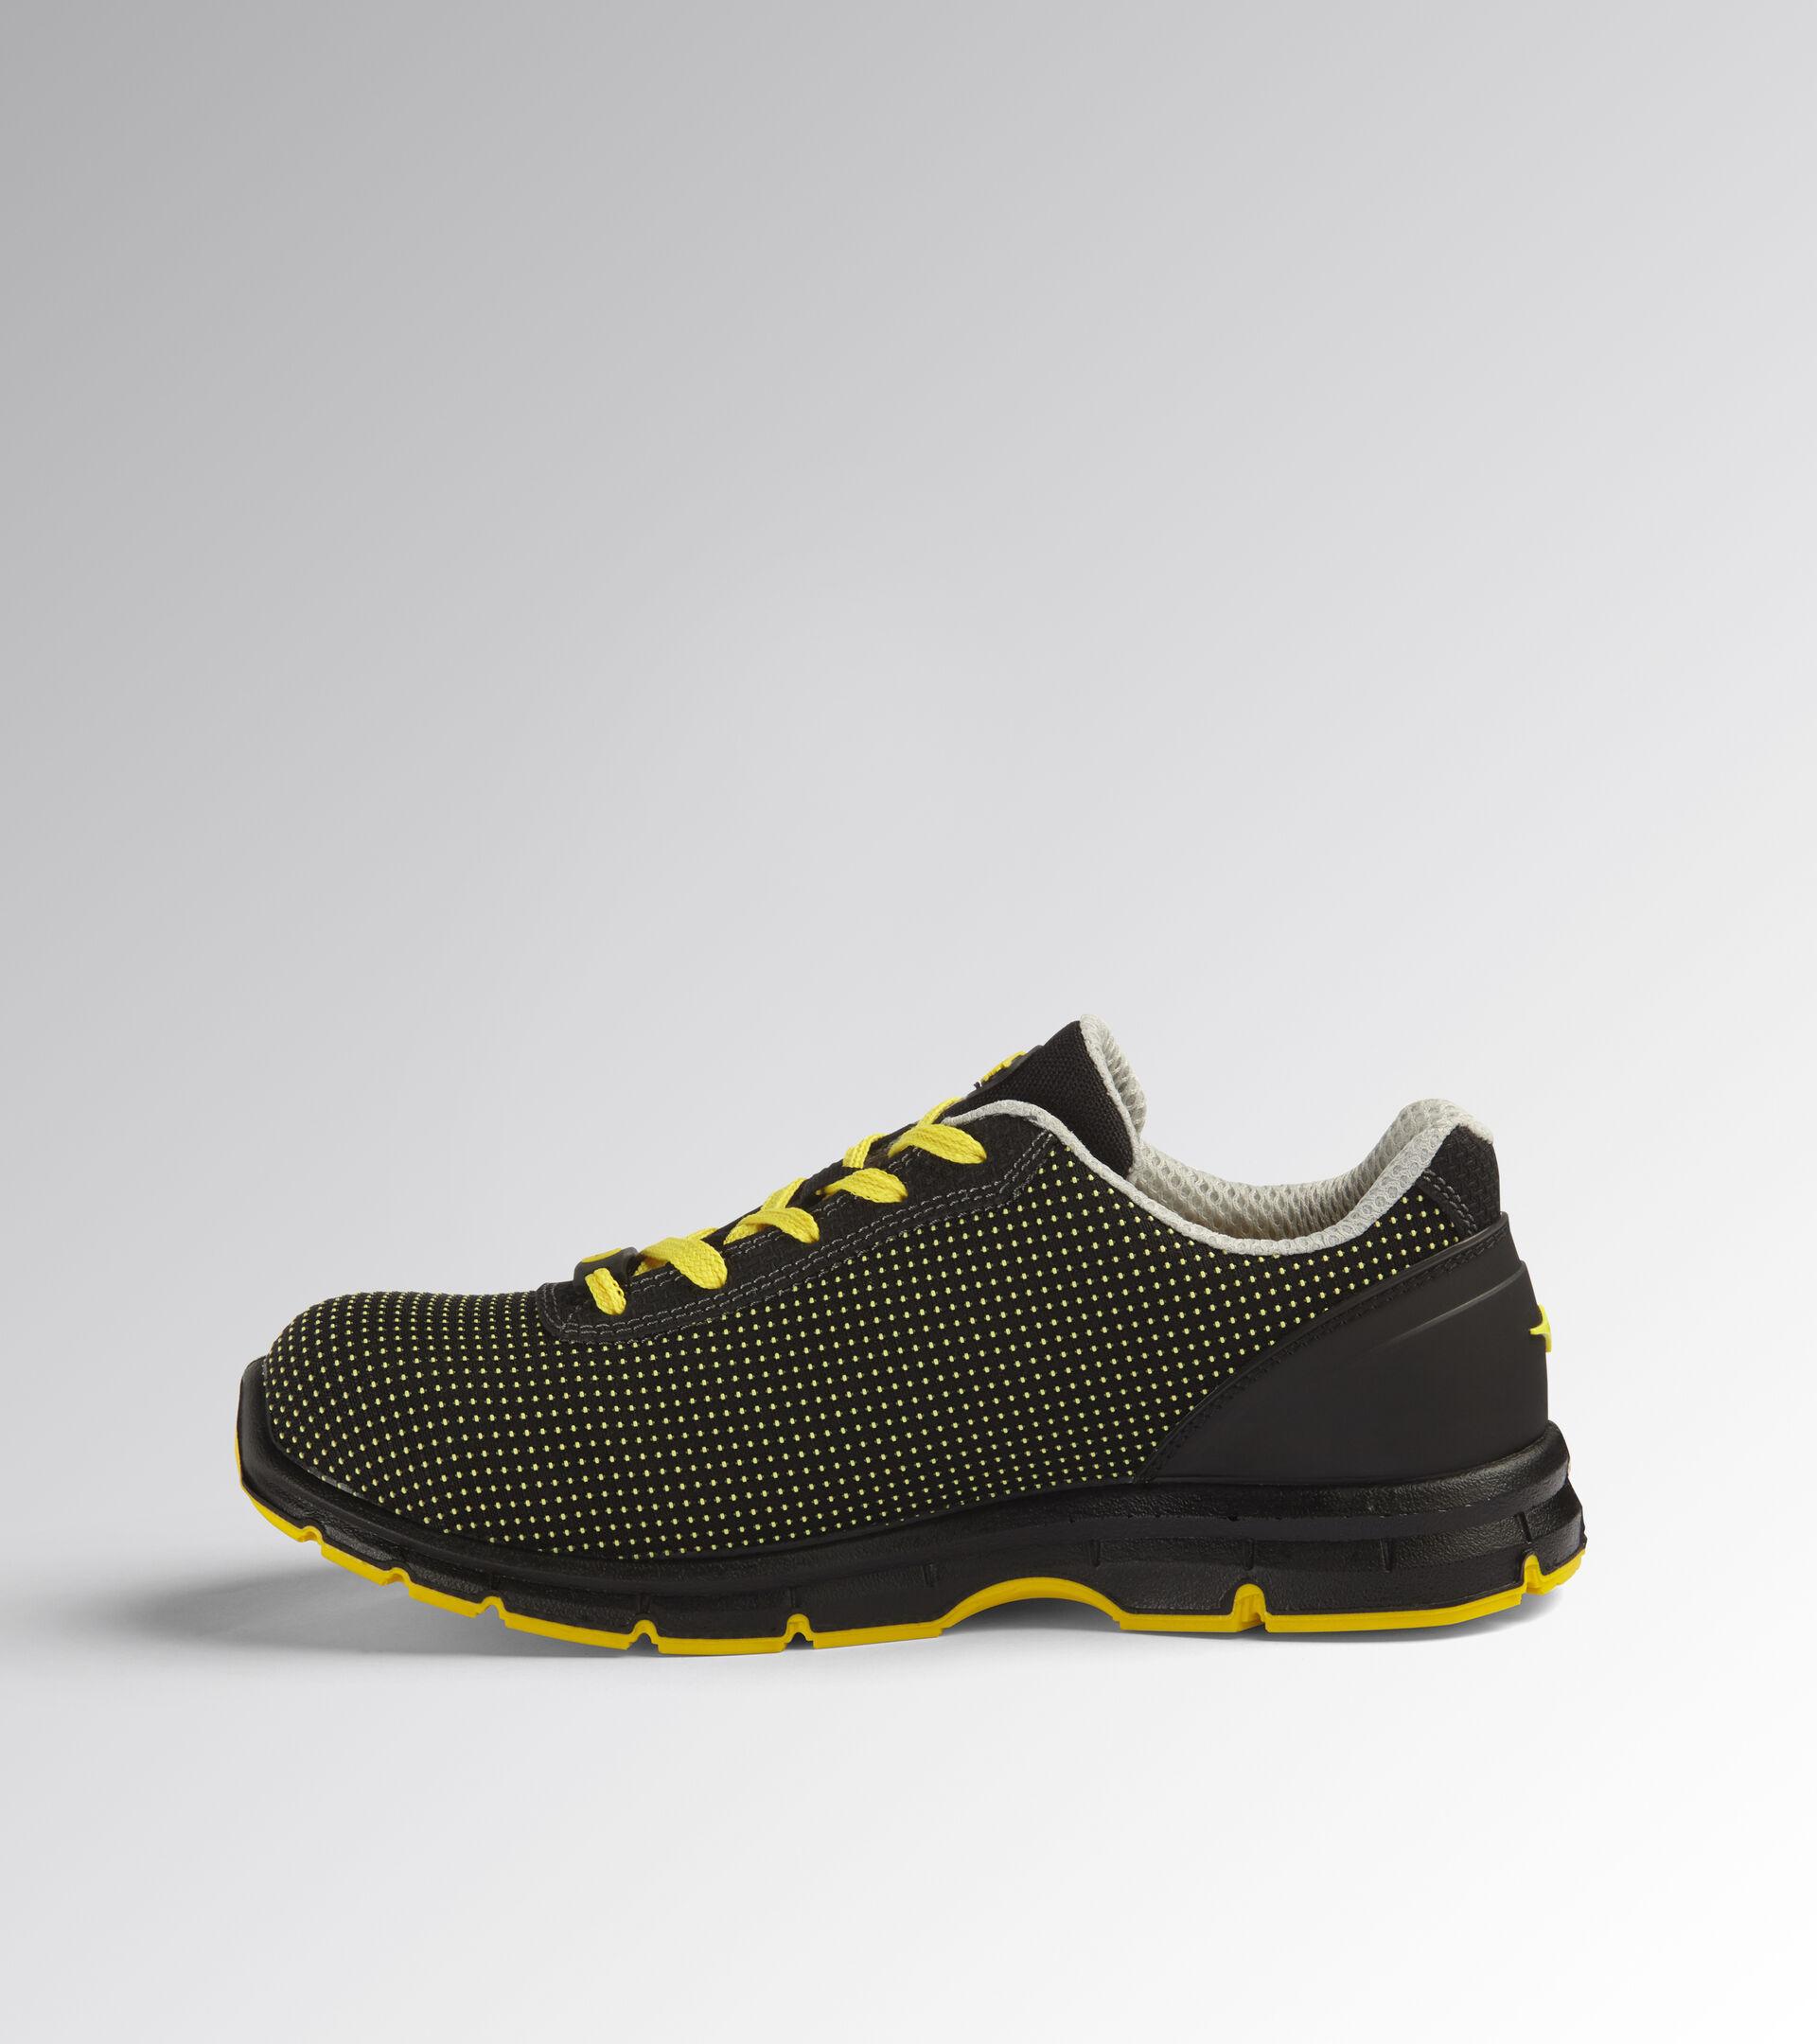 Footwear Utility UNISEX RUN ATOM LOW S3 SRC ESD BLACK /YELLOW CROMS Utility